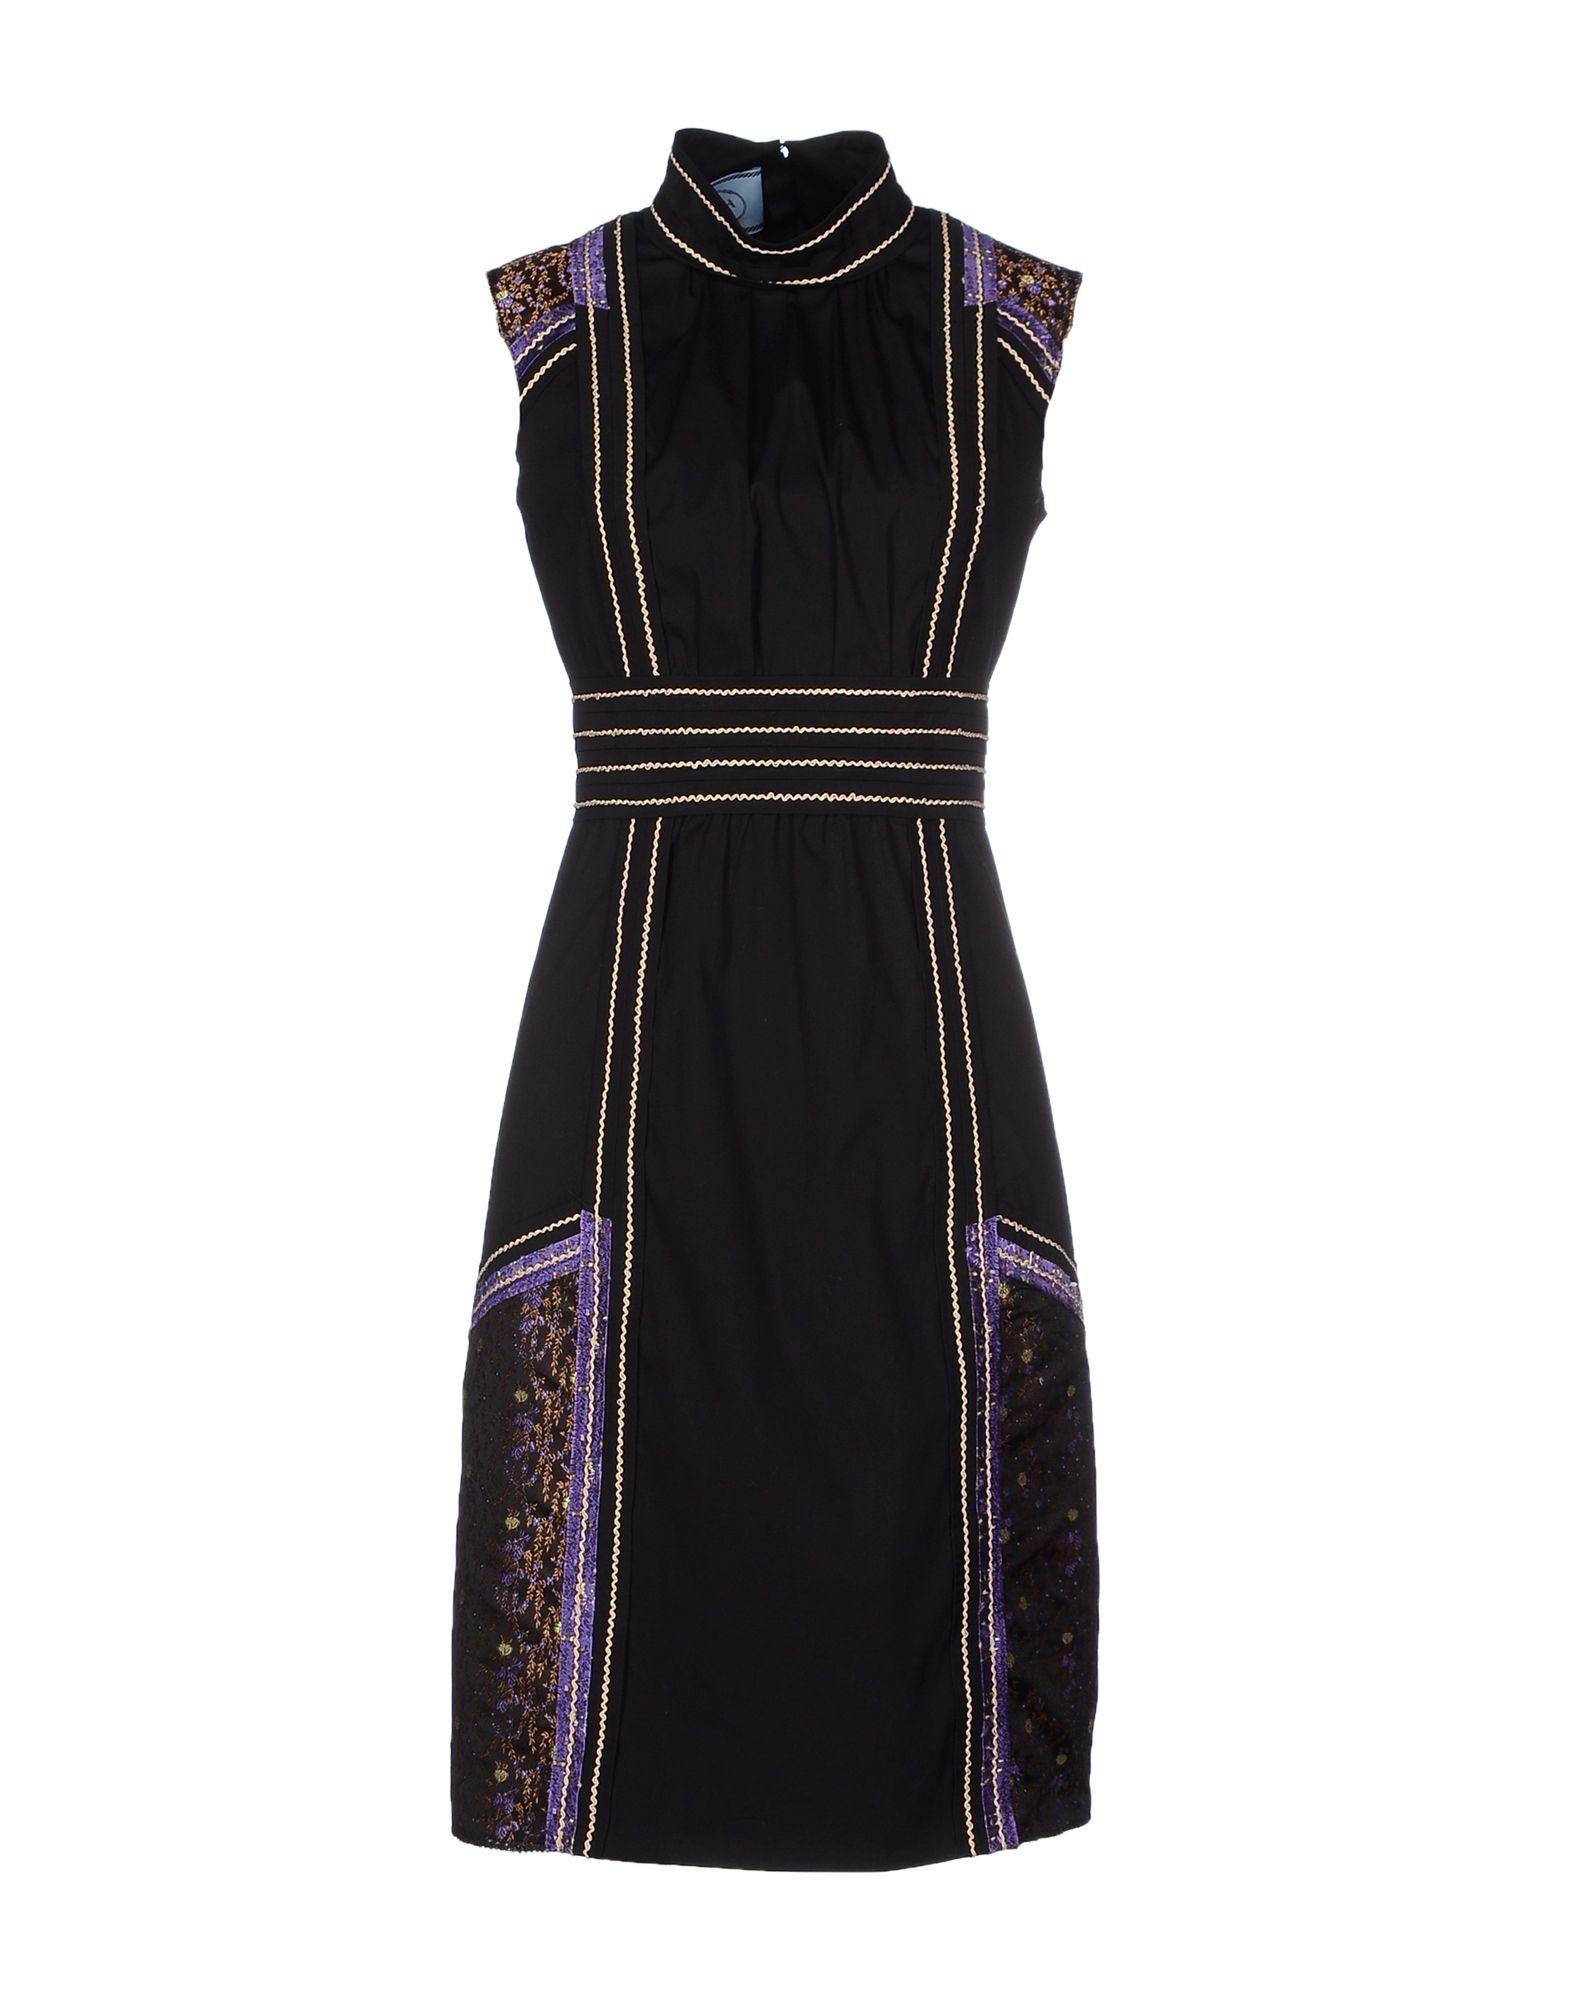 Prada Knee-length Dress in Black